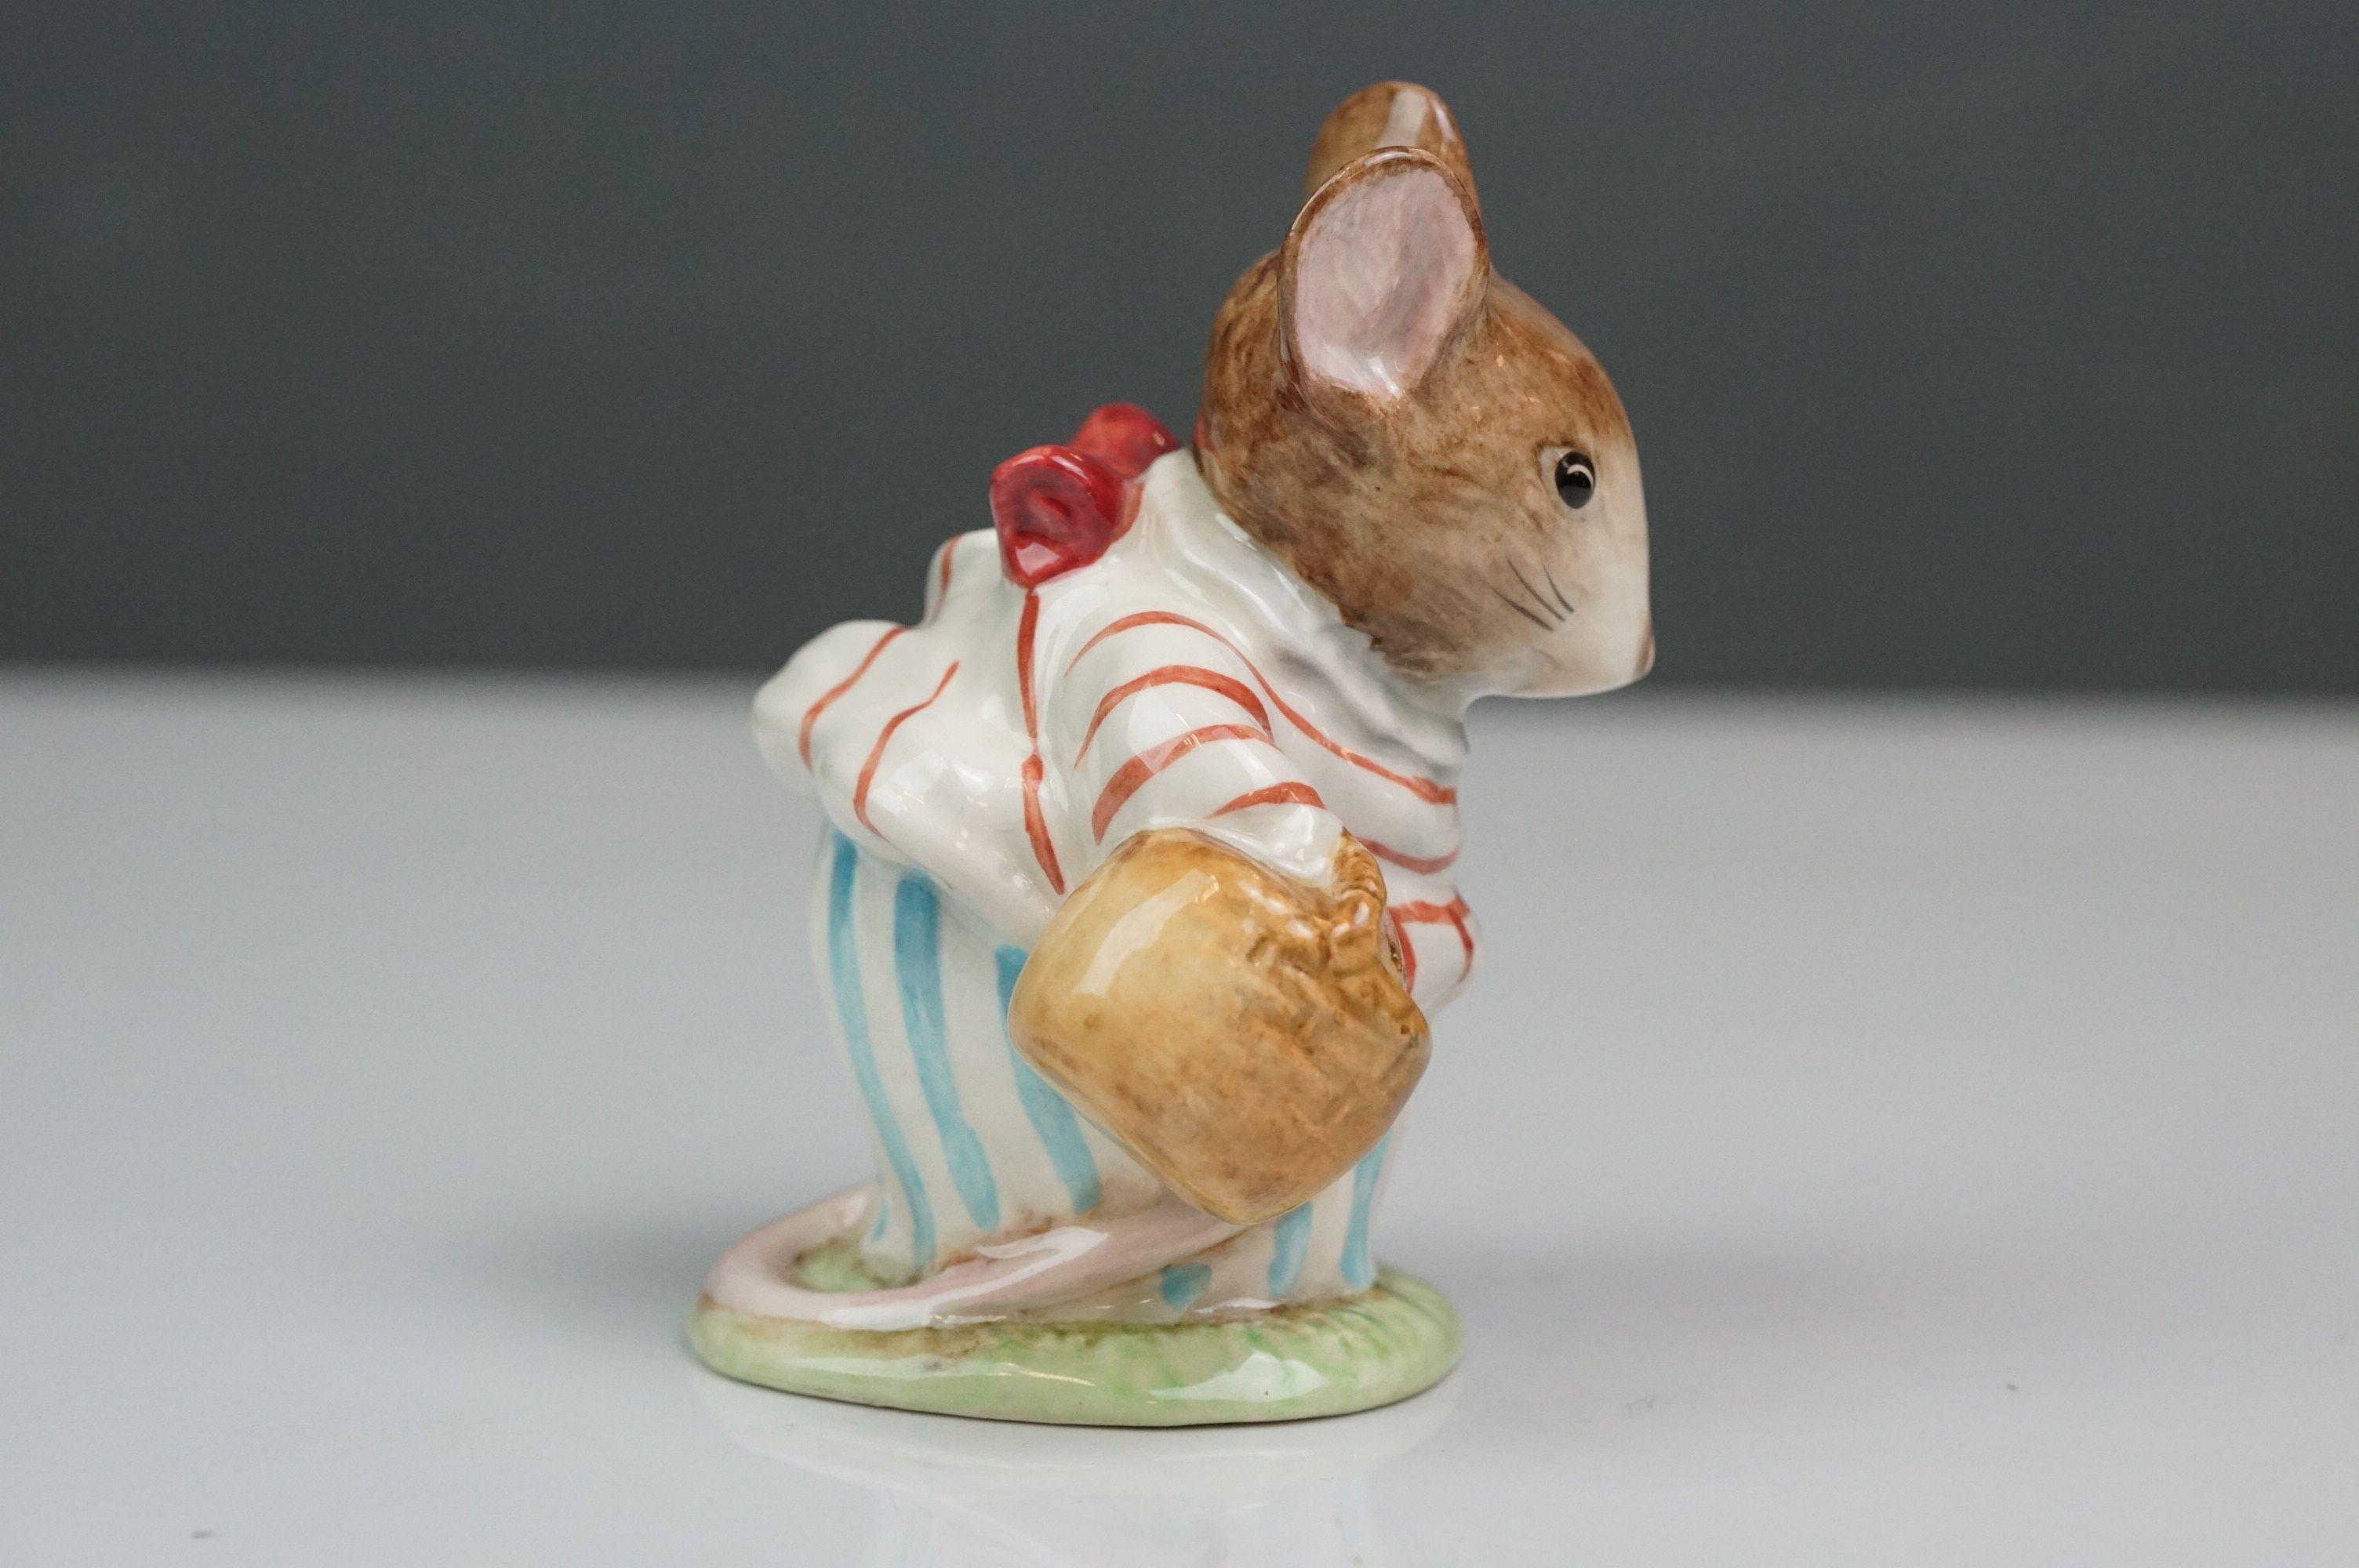 Beswick Beatrix Potter's Mrs Tittlemouse, style one, BP 1A No. 1103 - Image 2 of 5